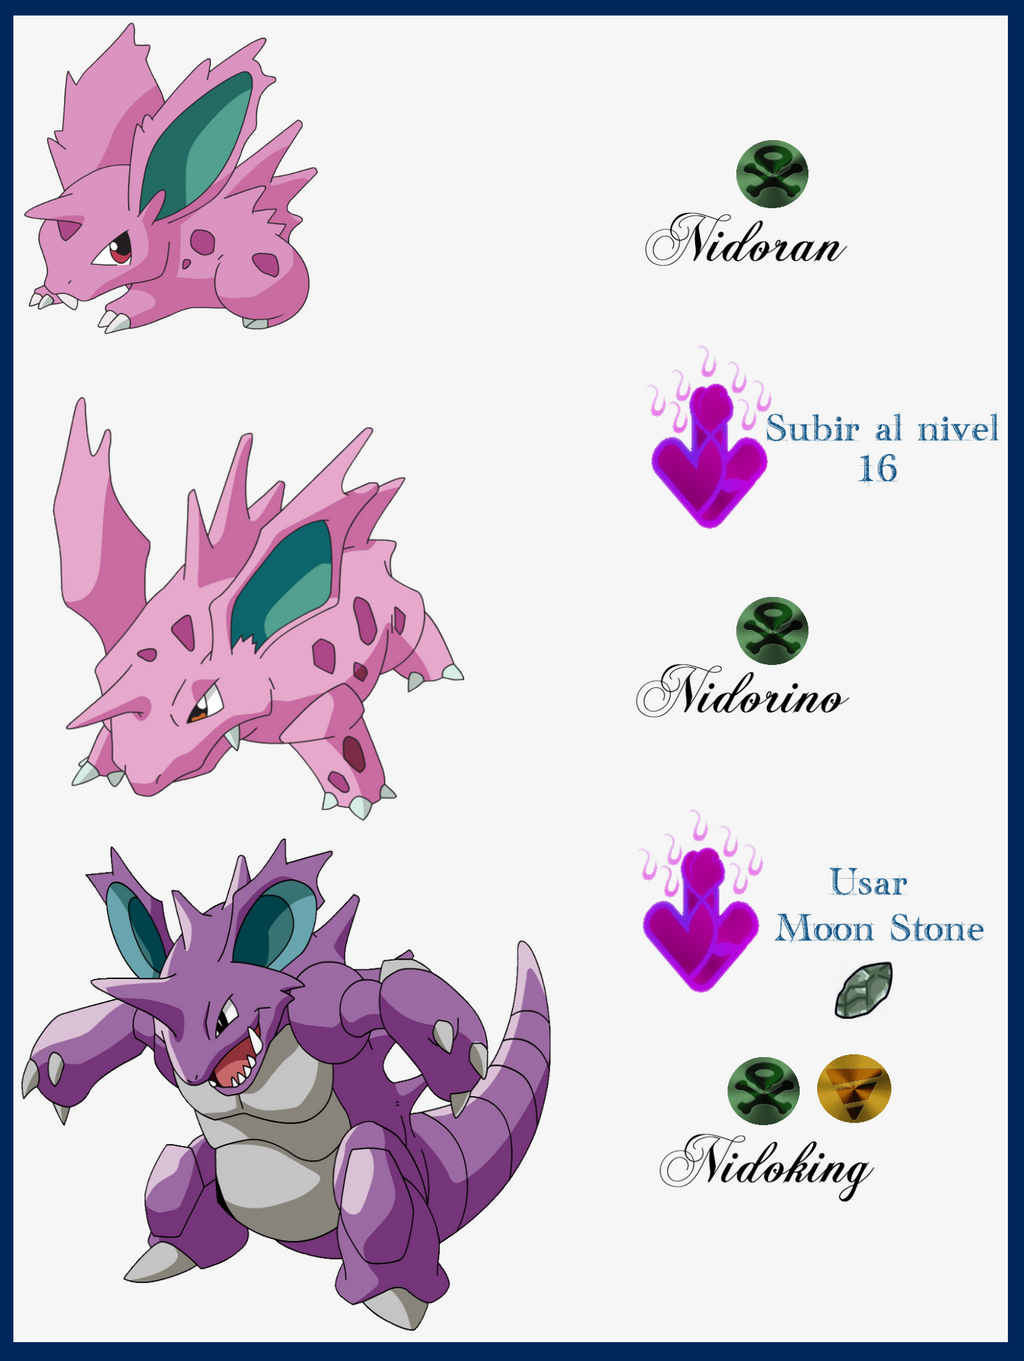 Pokemon Nidoran Evolution Chart Images | Pokemon Images